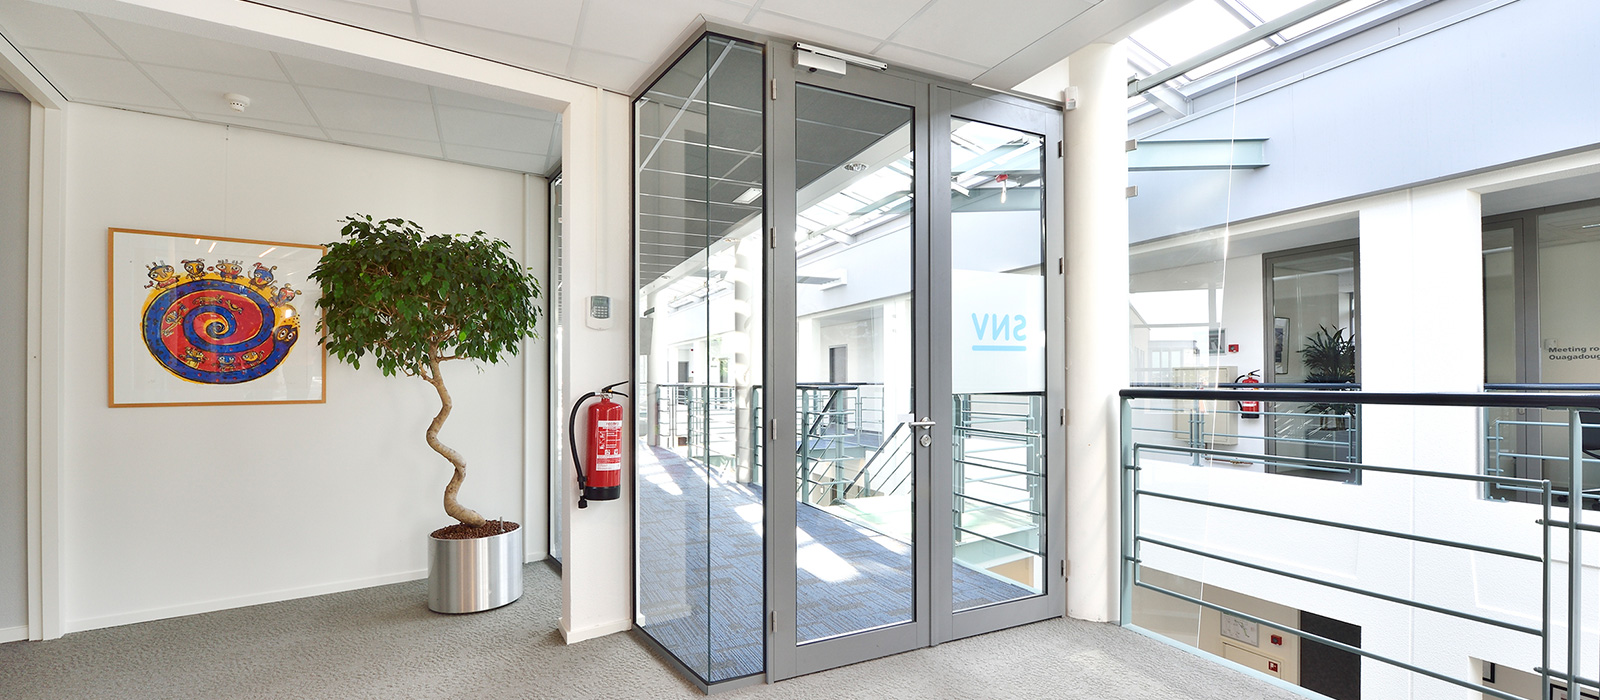 Vitriwand - SNV Den Haag